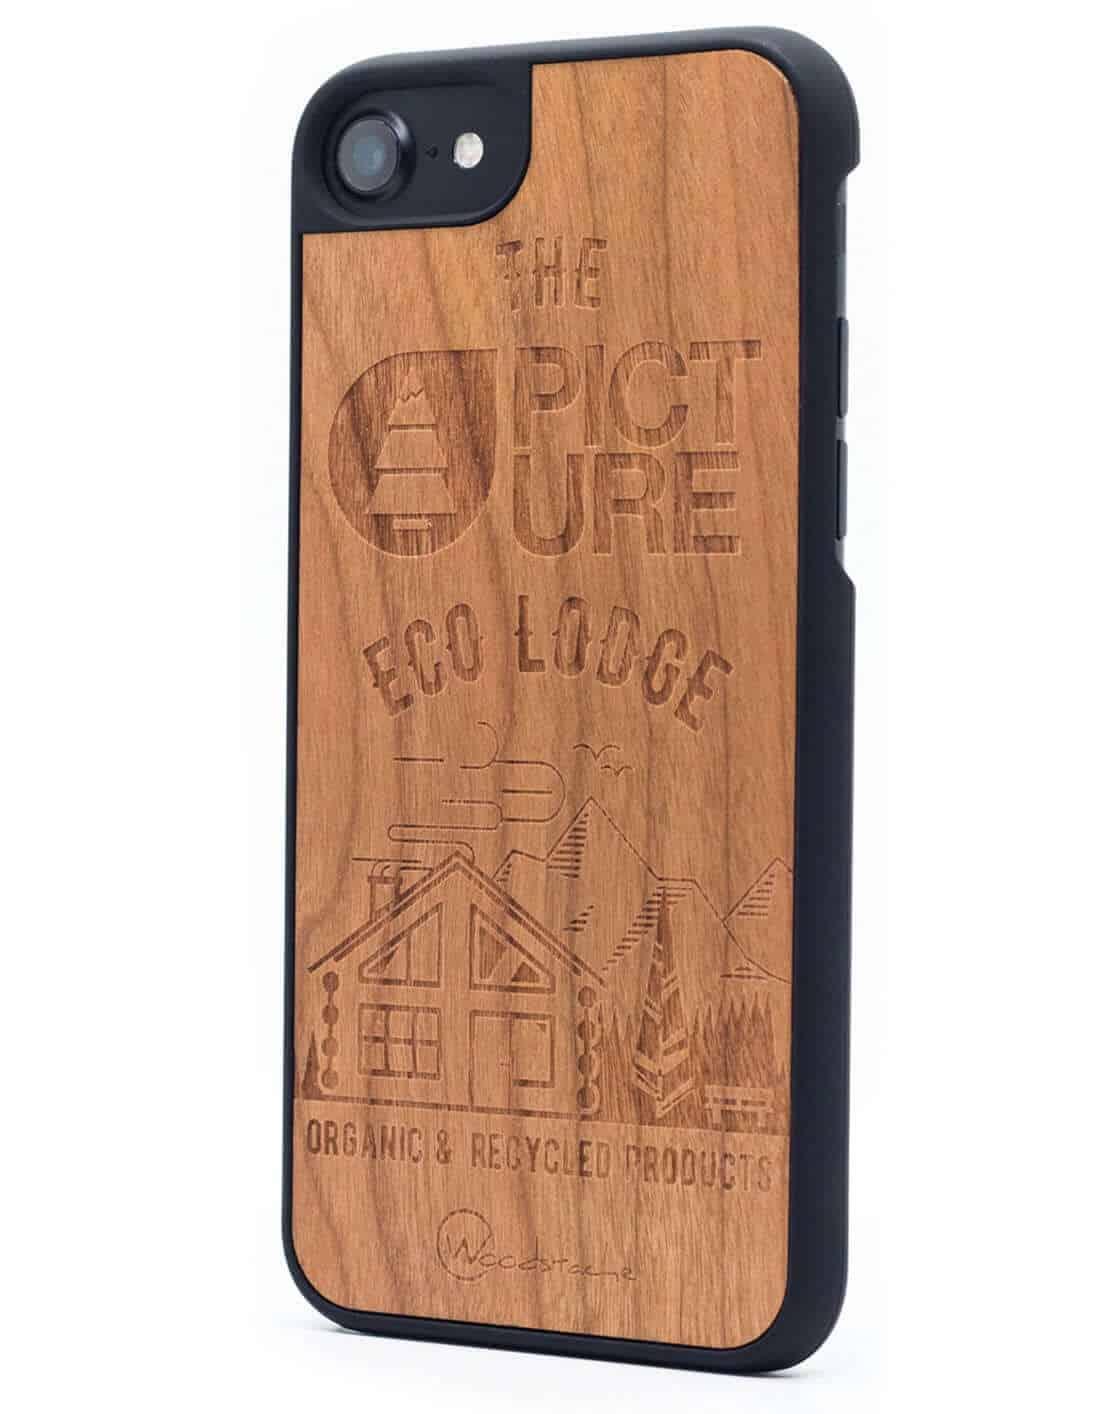 Woodstache x Picture fa iPhone 7-8 tok Eco-Lodge oldalról